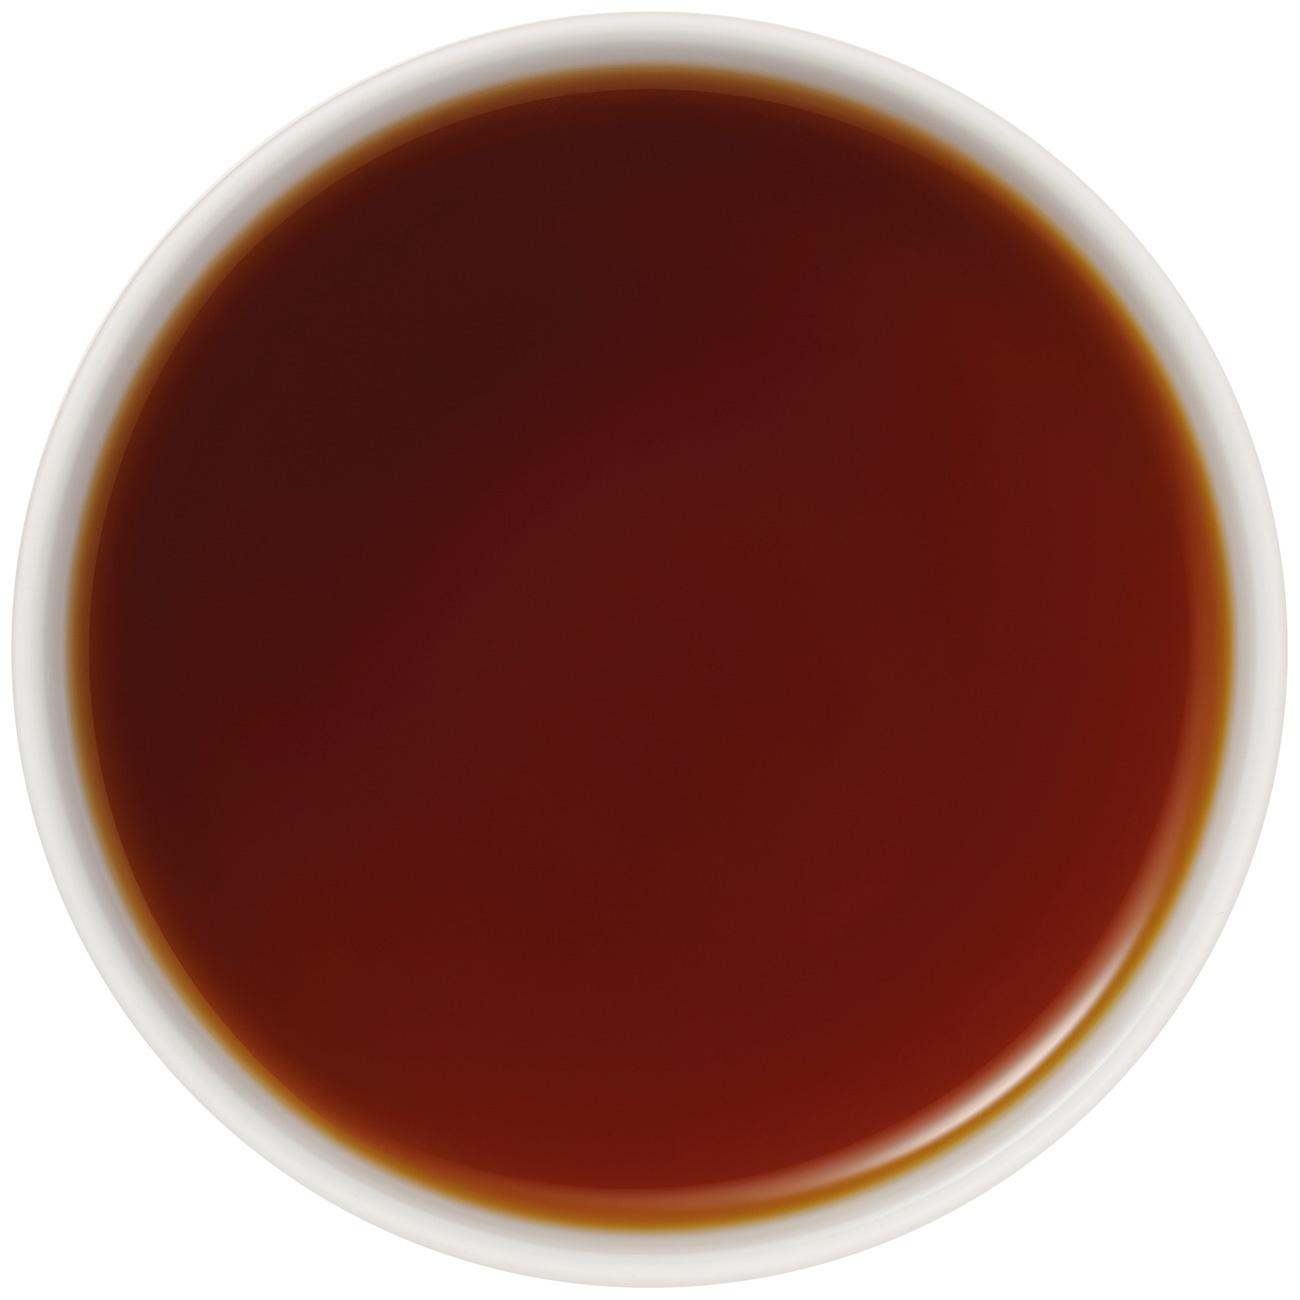 Rooibos Creamy Caramel-3